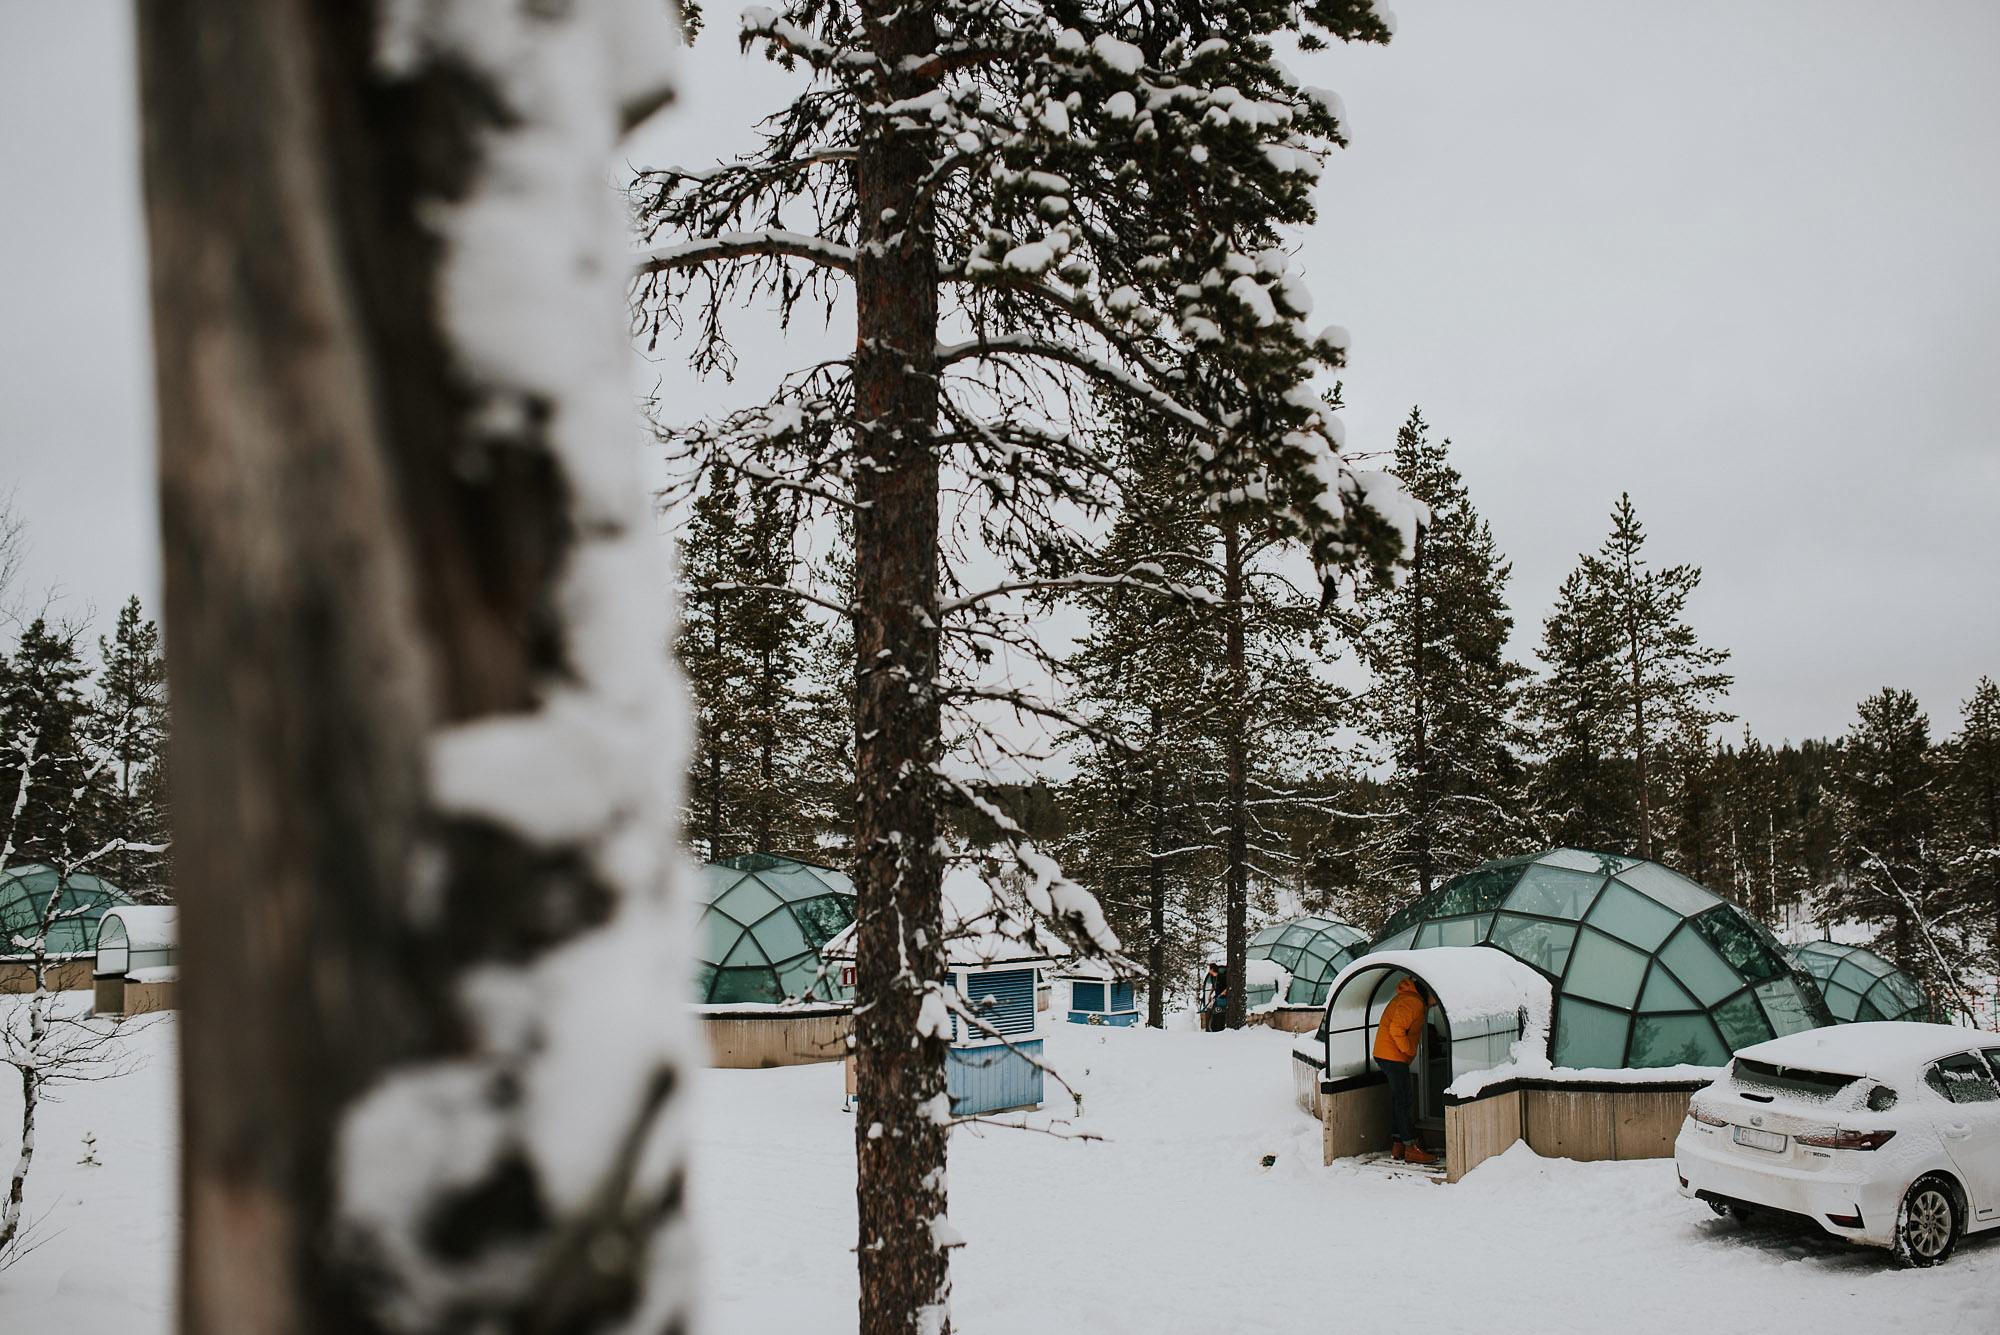 levi-ice-chapel-weddings-lapland-finland-photographer-jere-satamo-008-blog.jpg